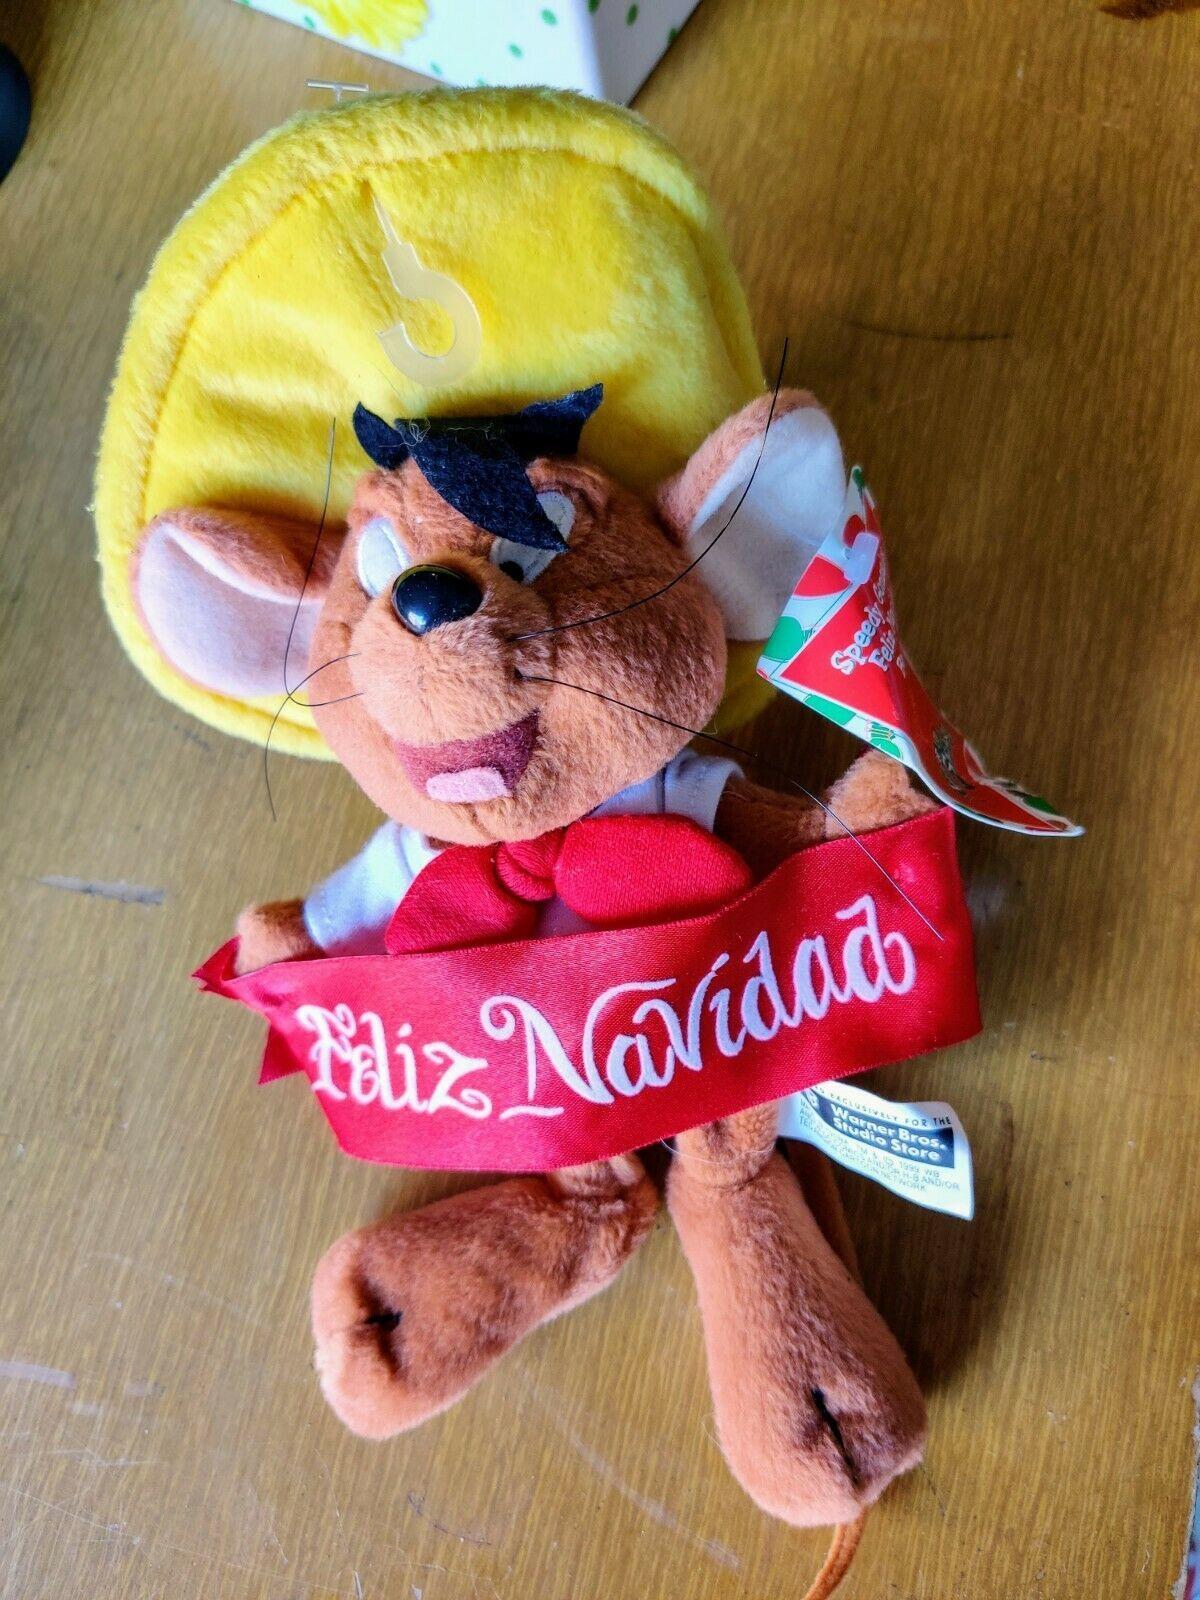 1999 Warner Bros Holiday FELIZ NAVIDAD SPEEDY GONZALES Bean bag Plush stuff toy - $11.43